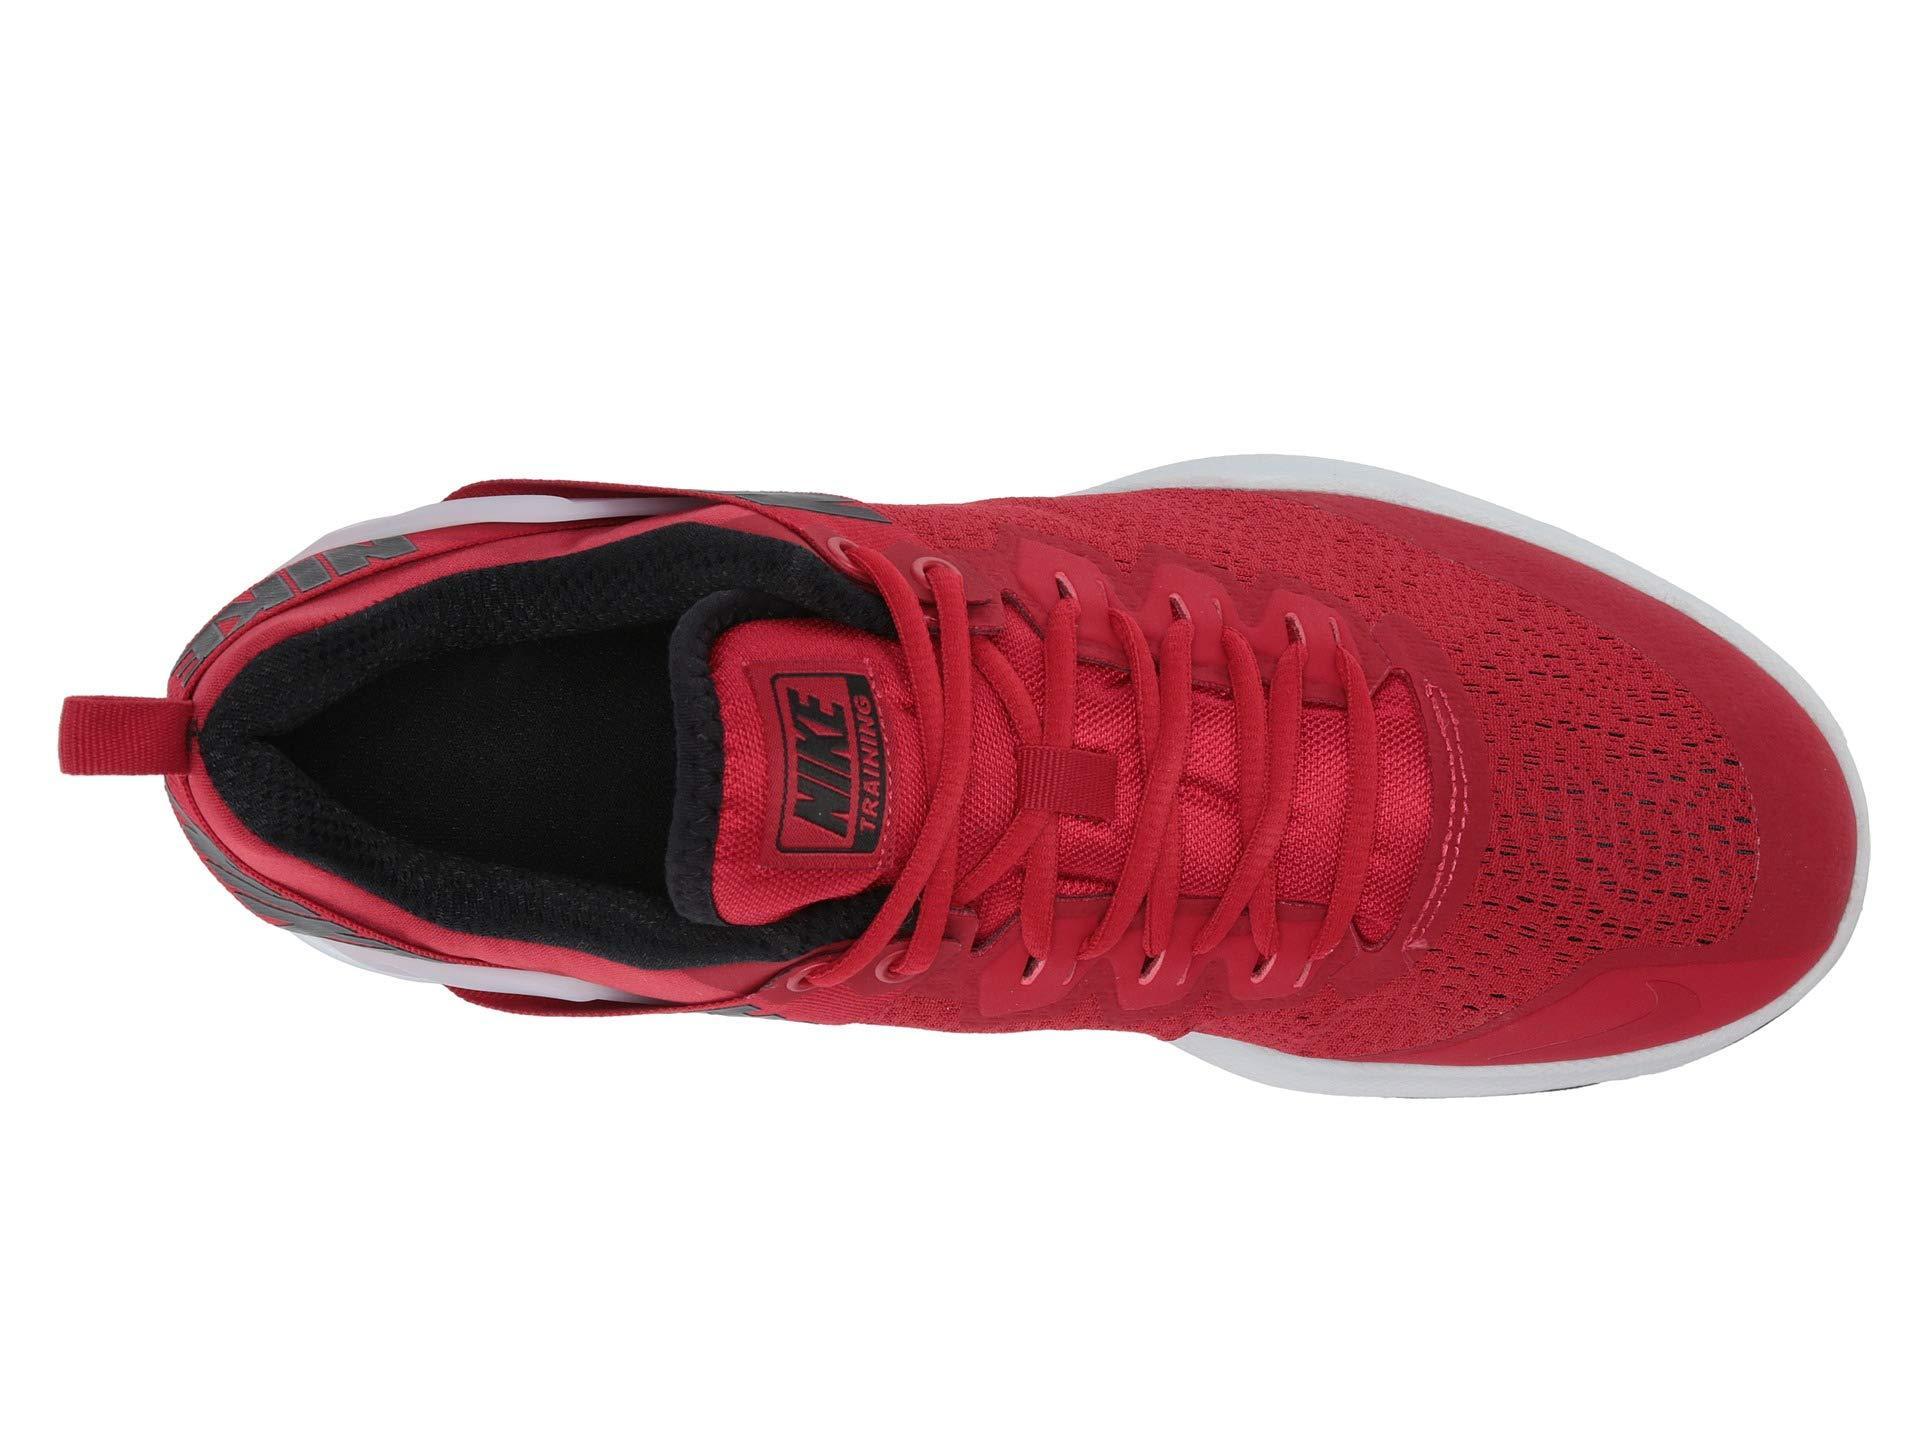 6d2b8f0109722 Nike - Red Zoom Domination Tr 2 (black white) Men s Cross Training Shoes.  View fullscreen